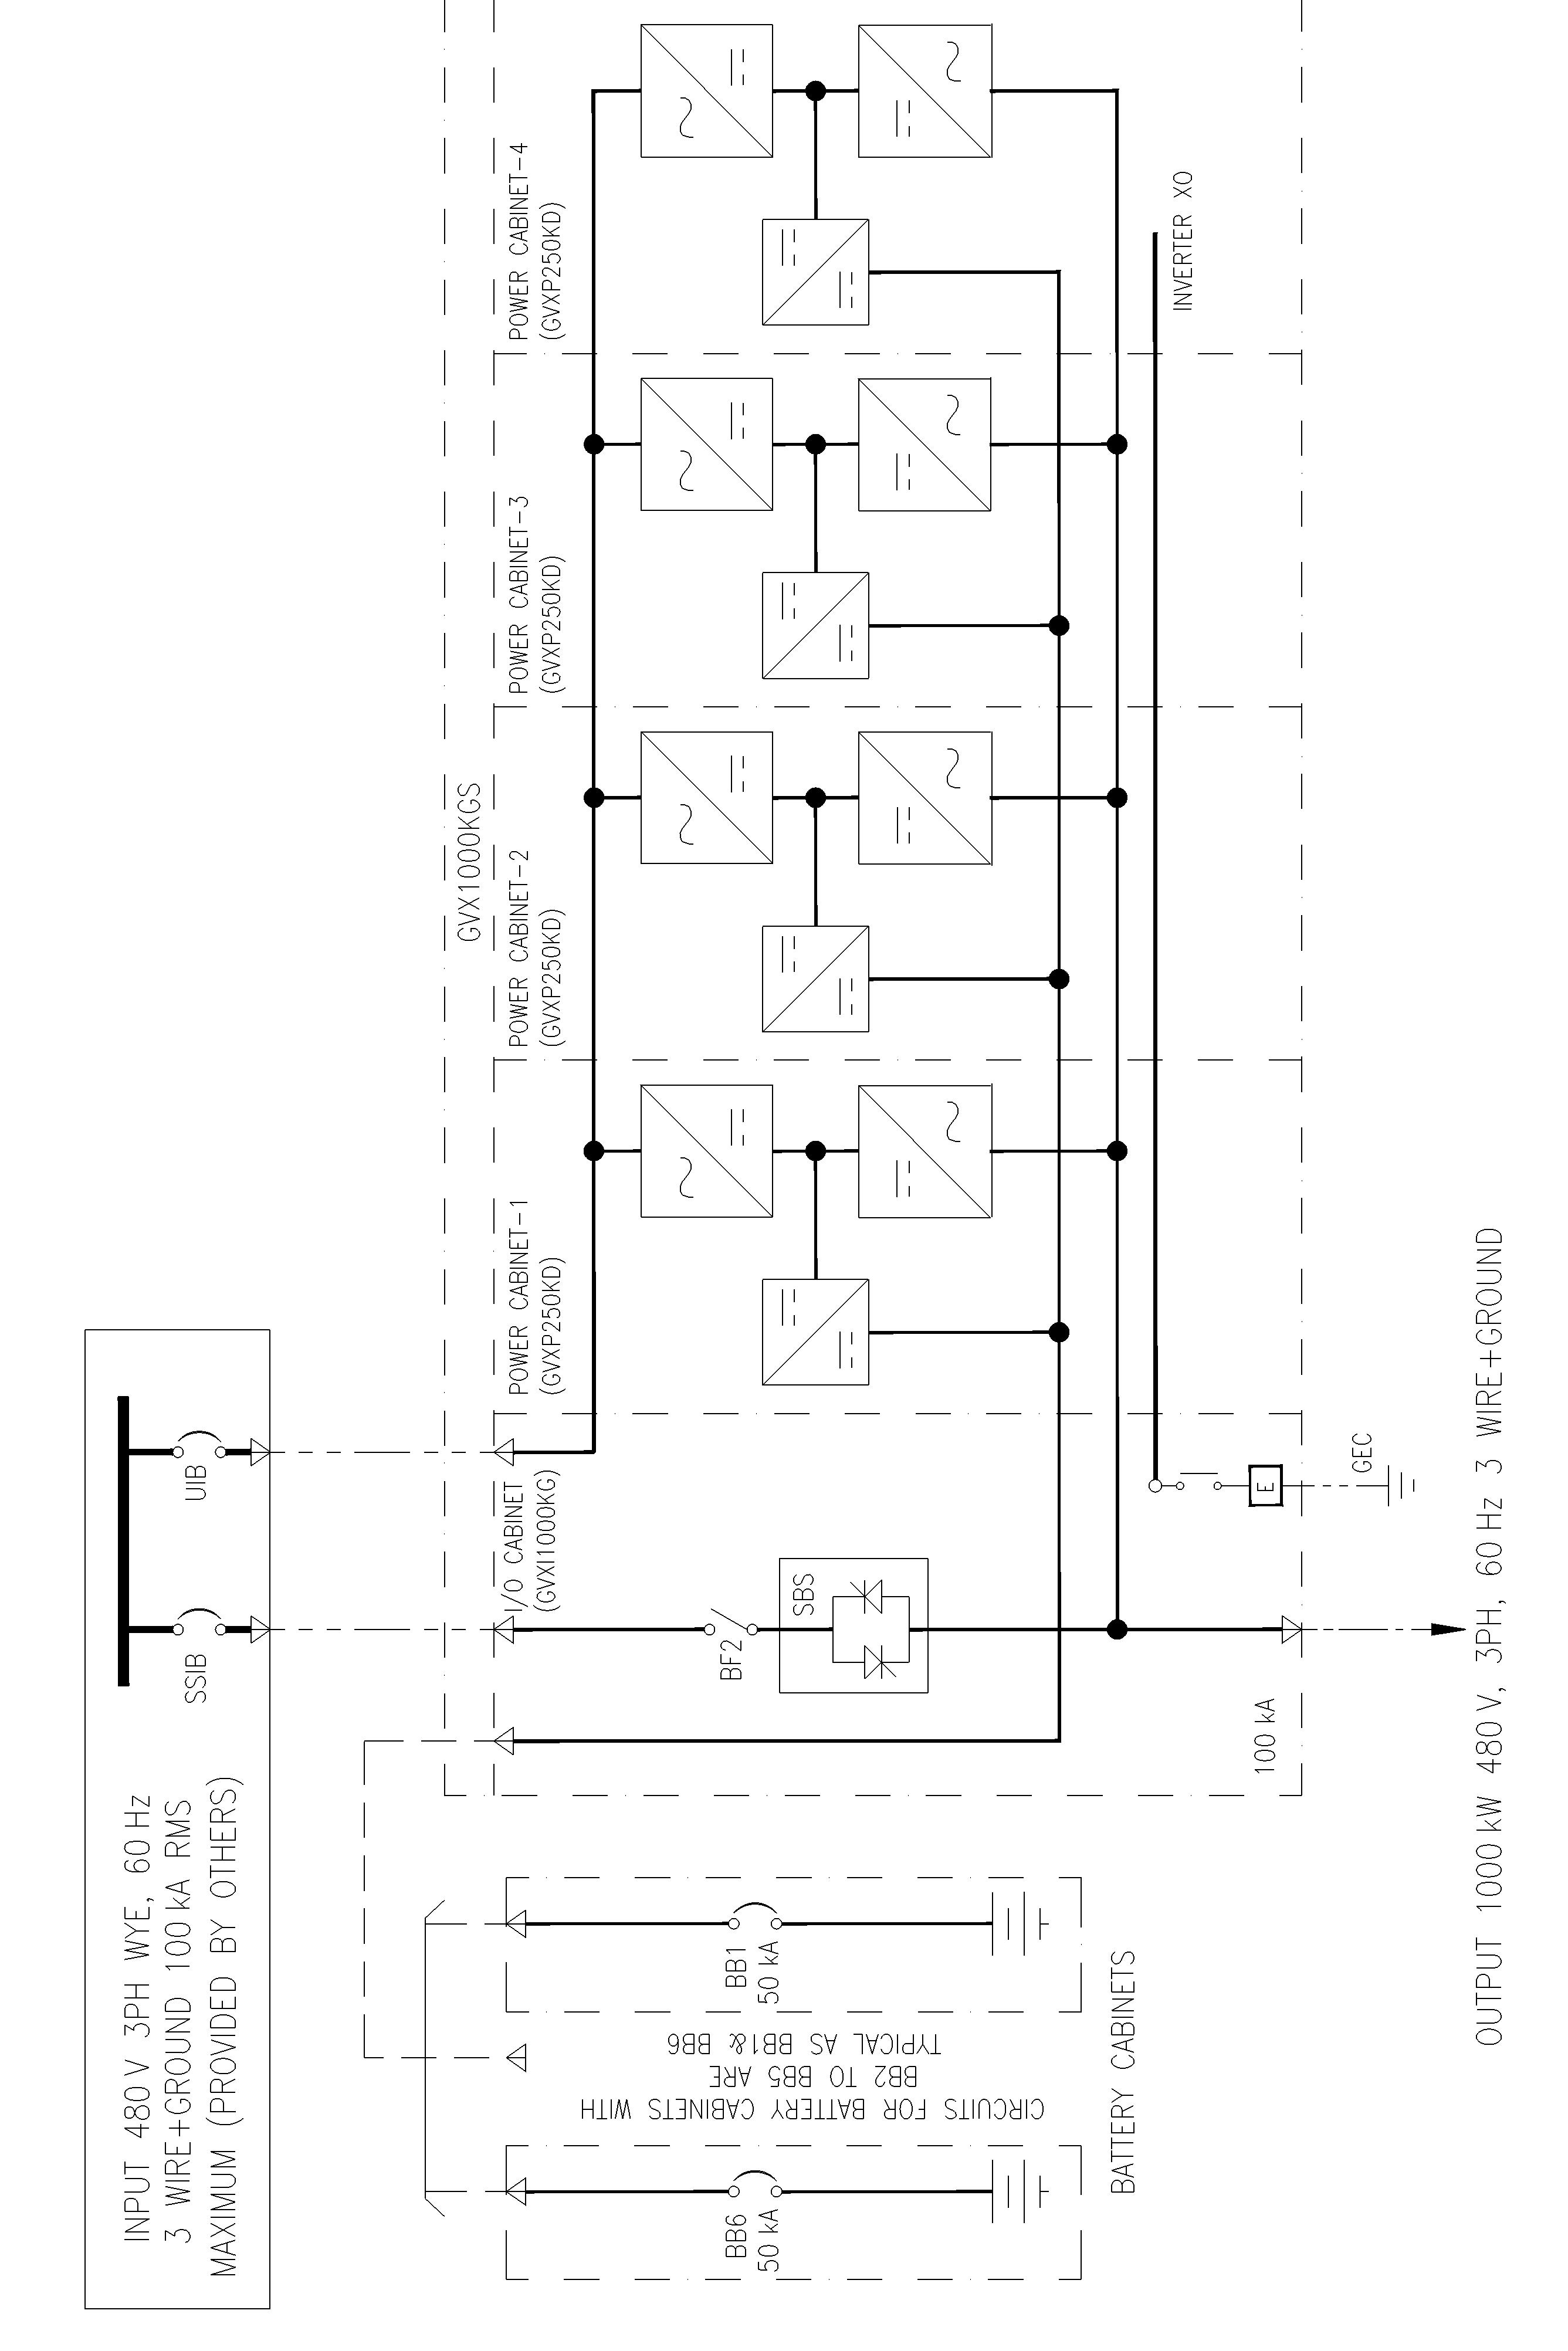 Ups Schematic Dual Wiring Diagrams Data Base Apc Diagram Galaxy Vx 1000 Kw Mains Technical Manuals 480 V Rh Productinfo Schneider Electric